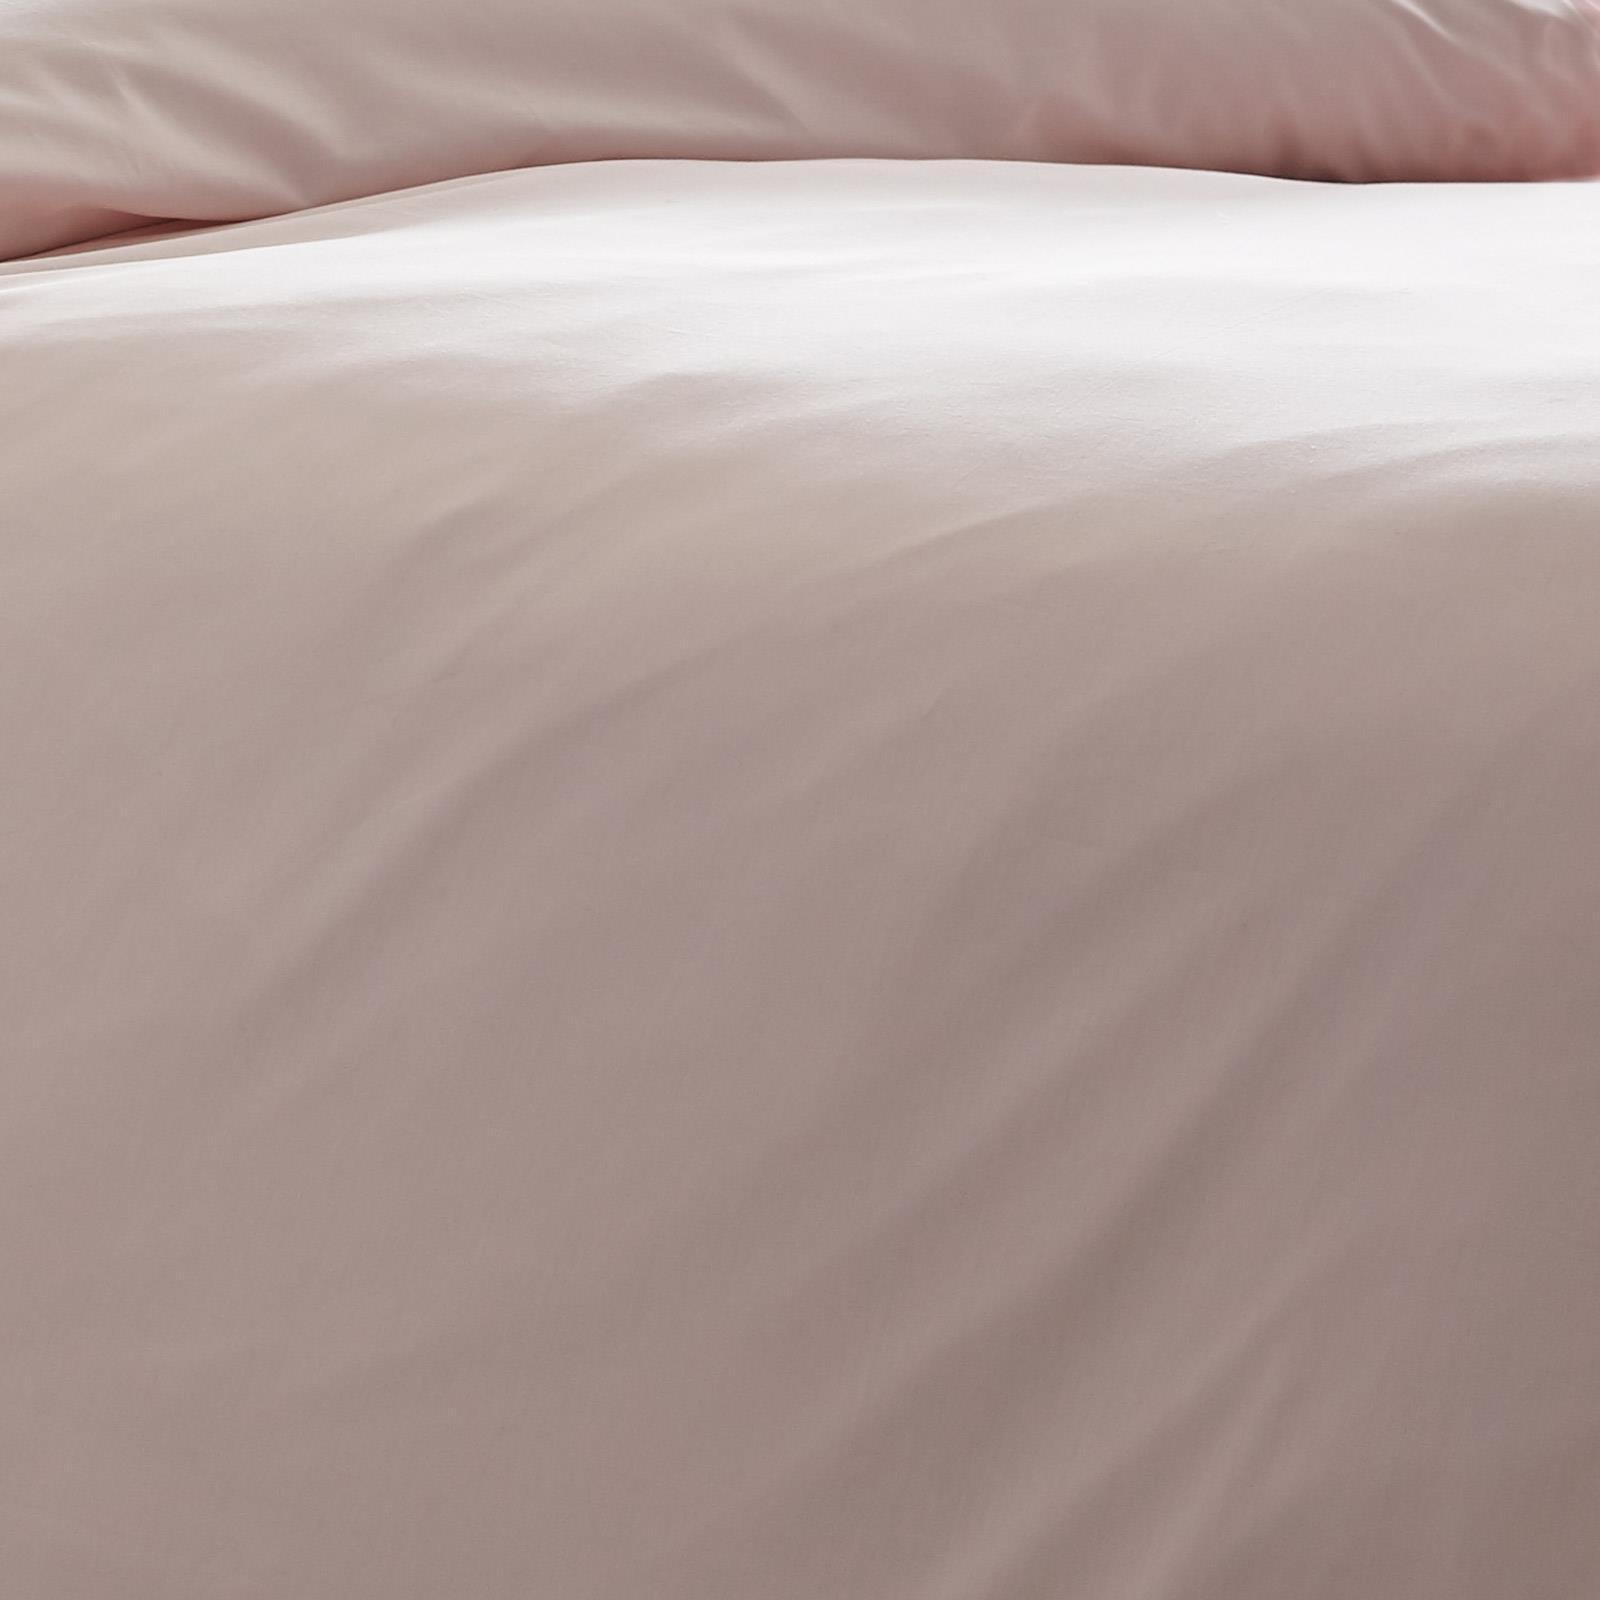 Blush-fundas-nordicas-Rosa-100-algodon-200-Hilos-Llano-Edredon-Conjuntos-de-Cama miniatura 9